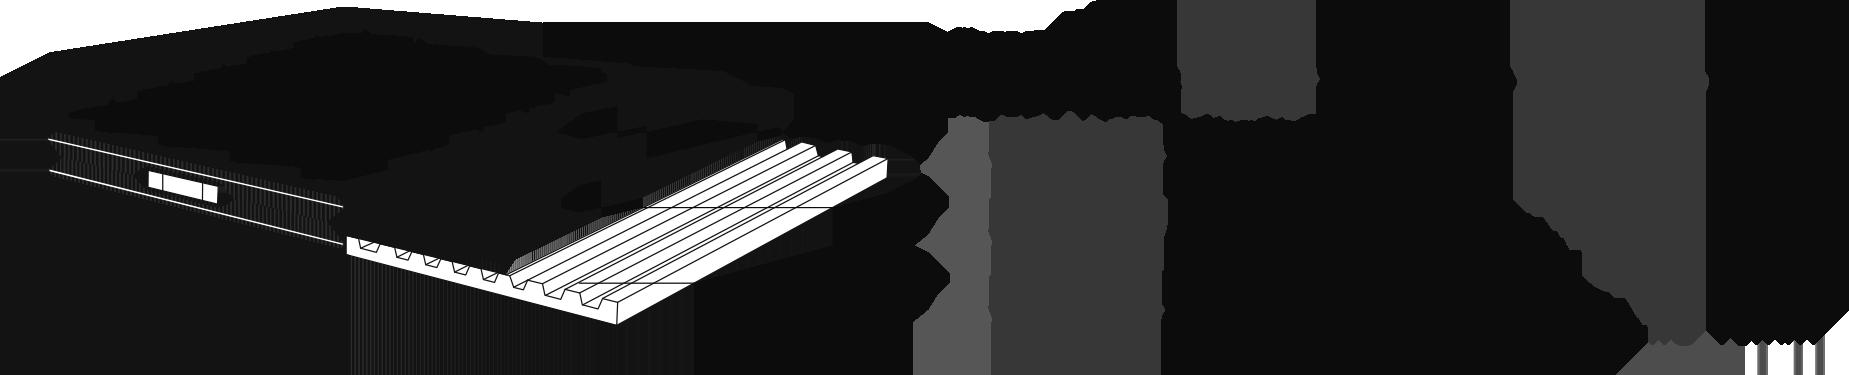 Composition du matelas : BFOAM 35 kg / m3, BFOAM 40 kg / m3, BFOAM 35 kg / m3